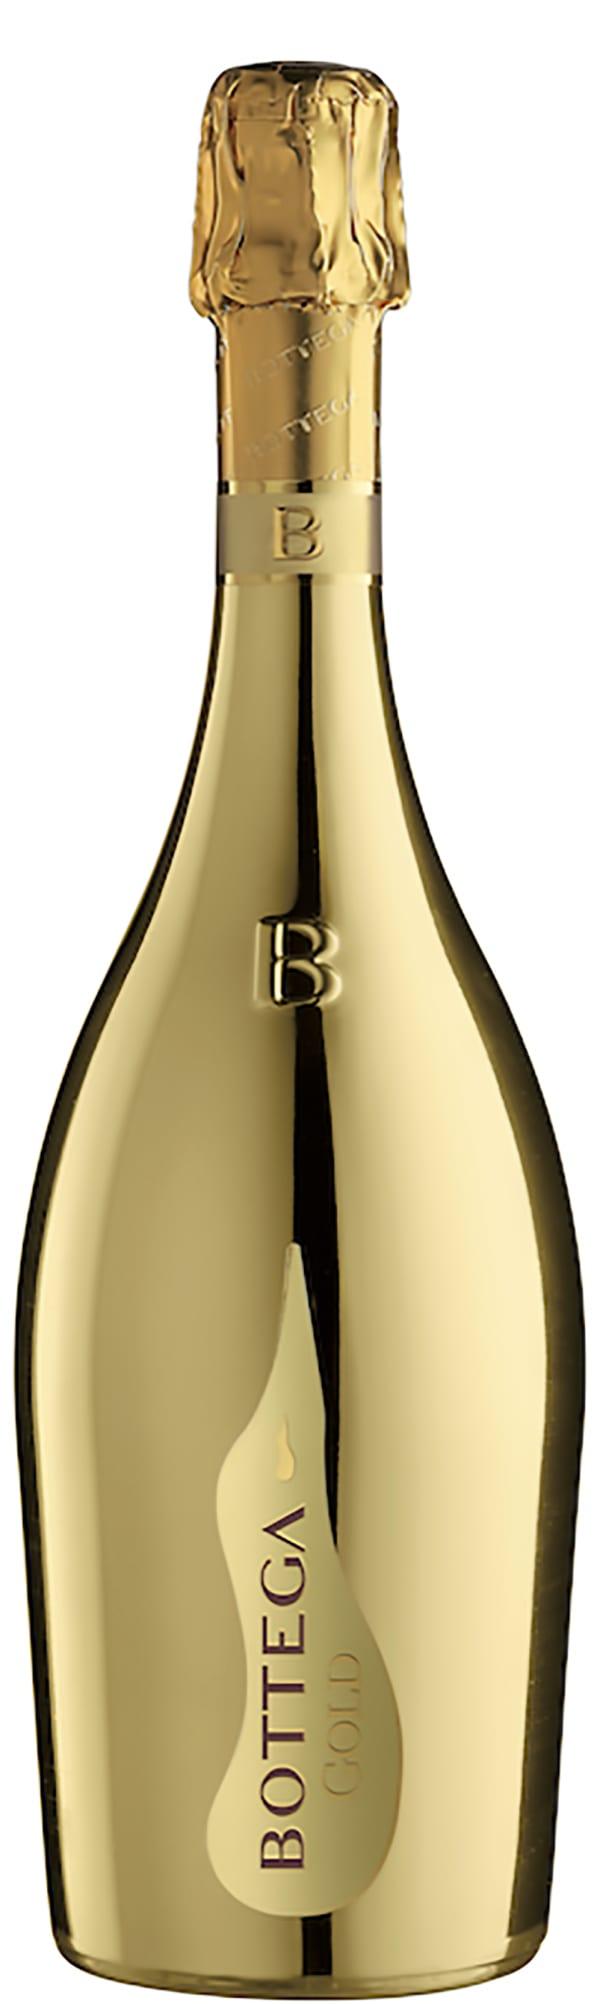 Bottega Gold Brut 2017